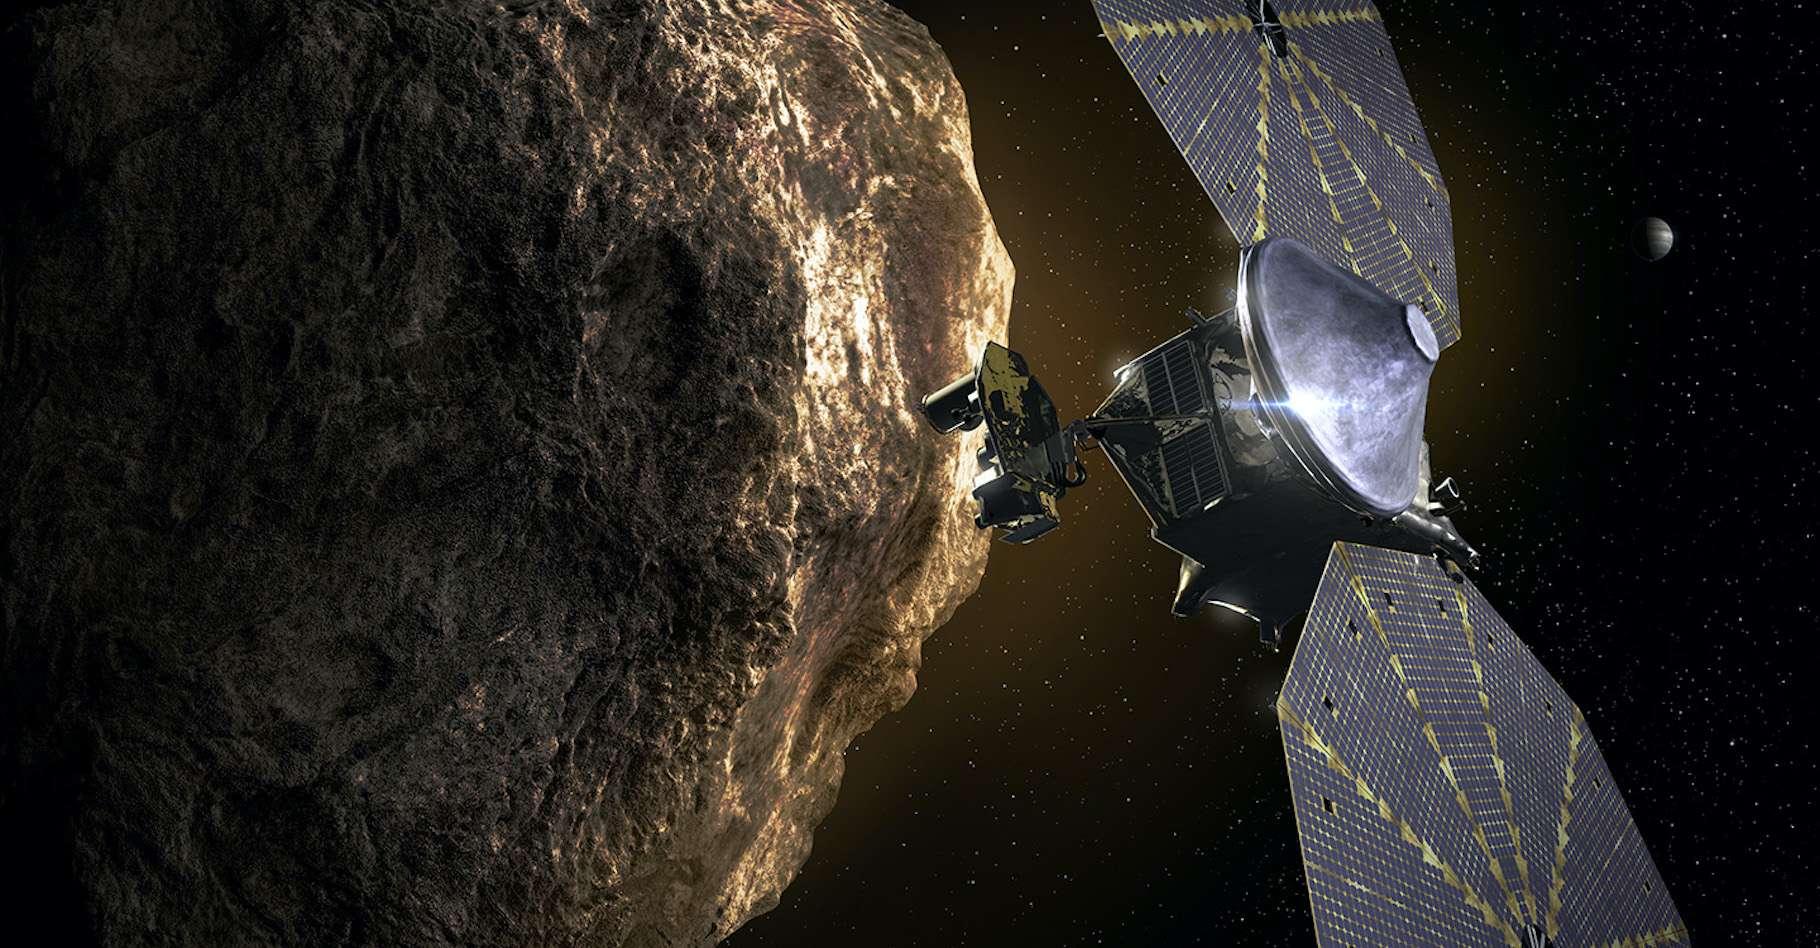 Illustration de Lucy visitant l'astéroïde troyen Eurybates. © Nasa, SwRI